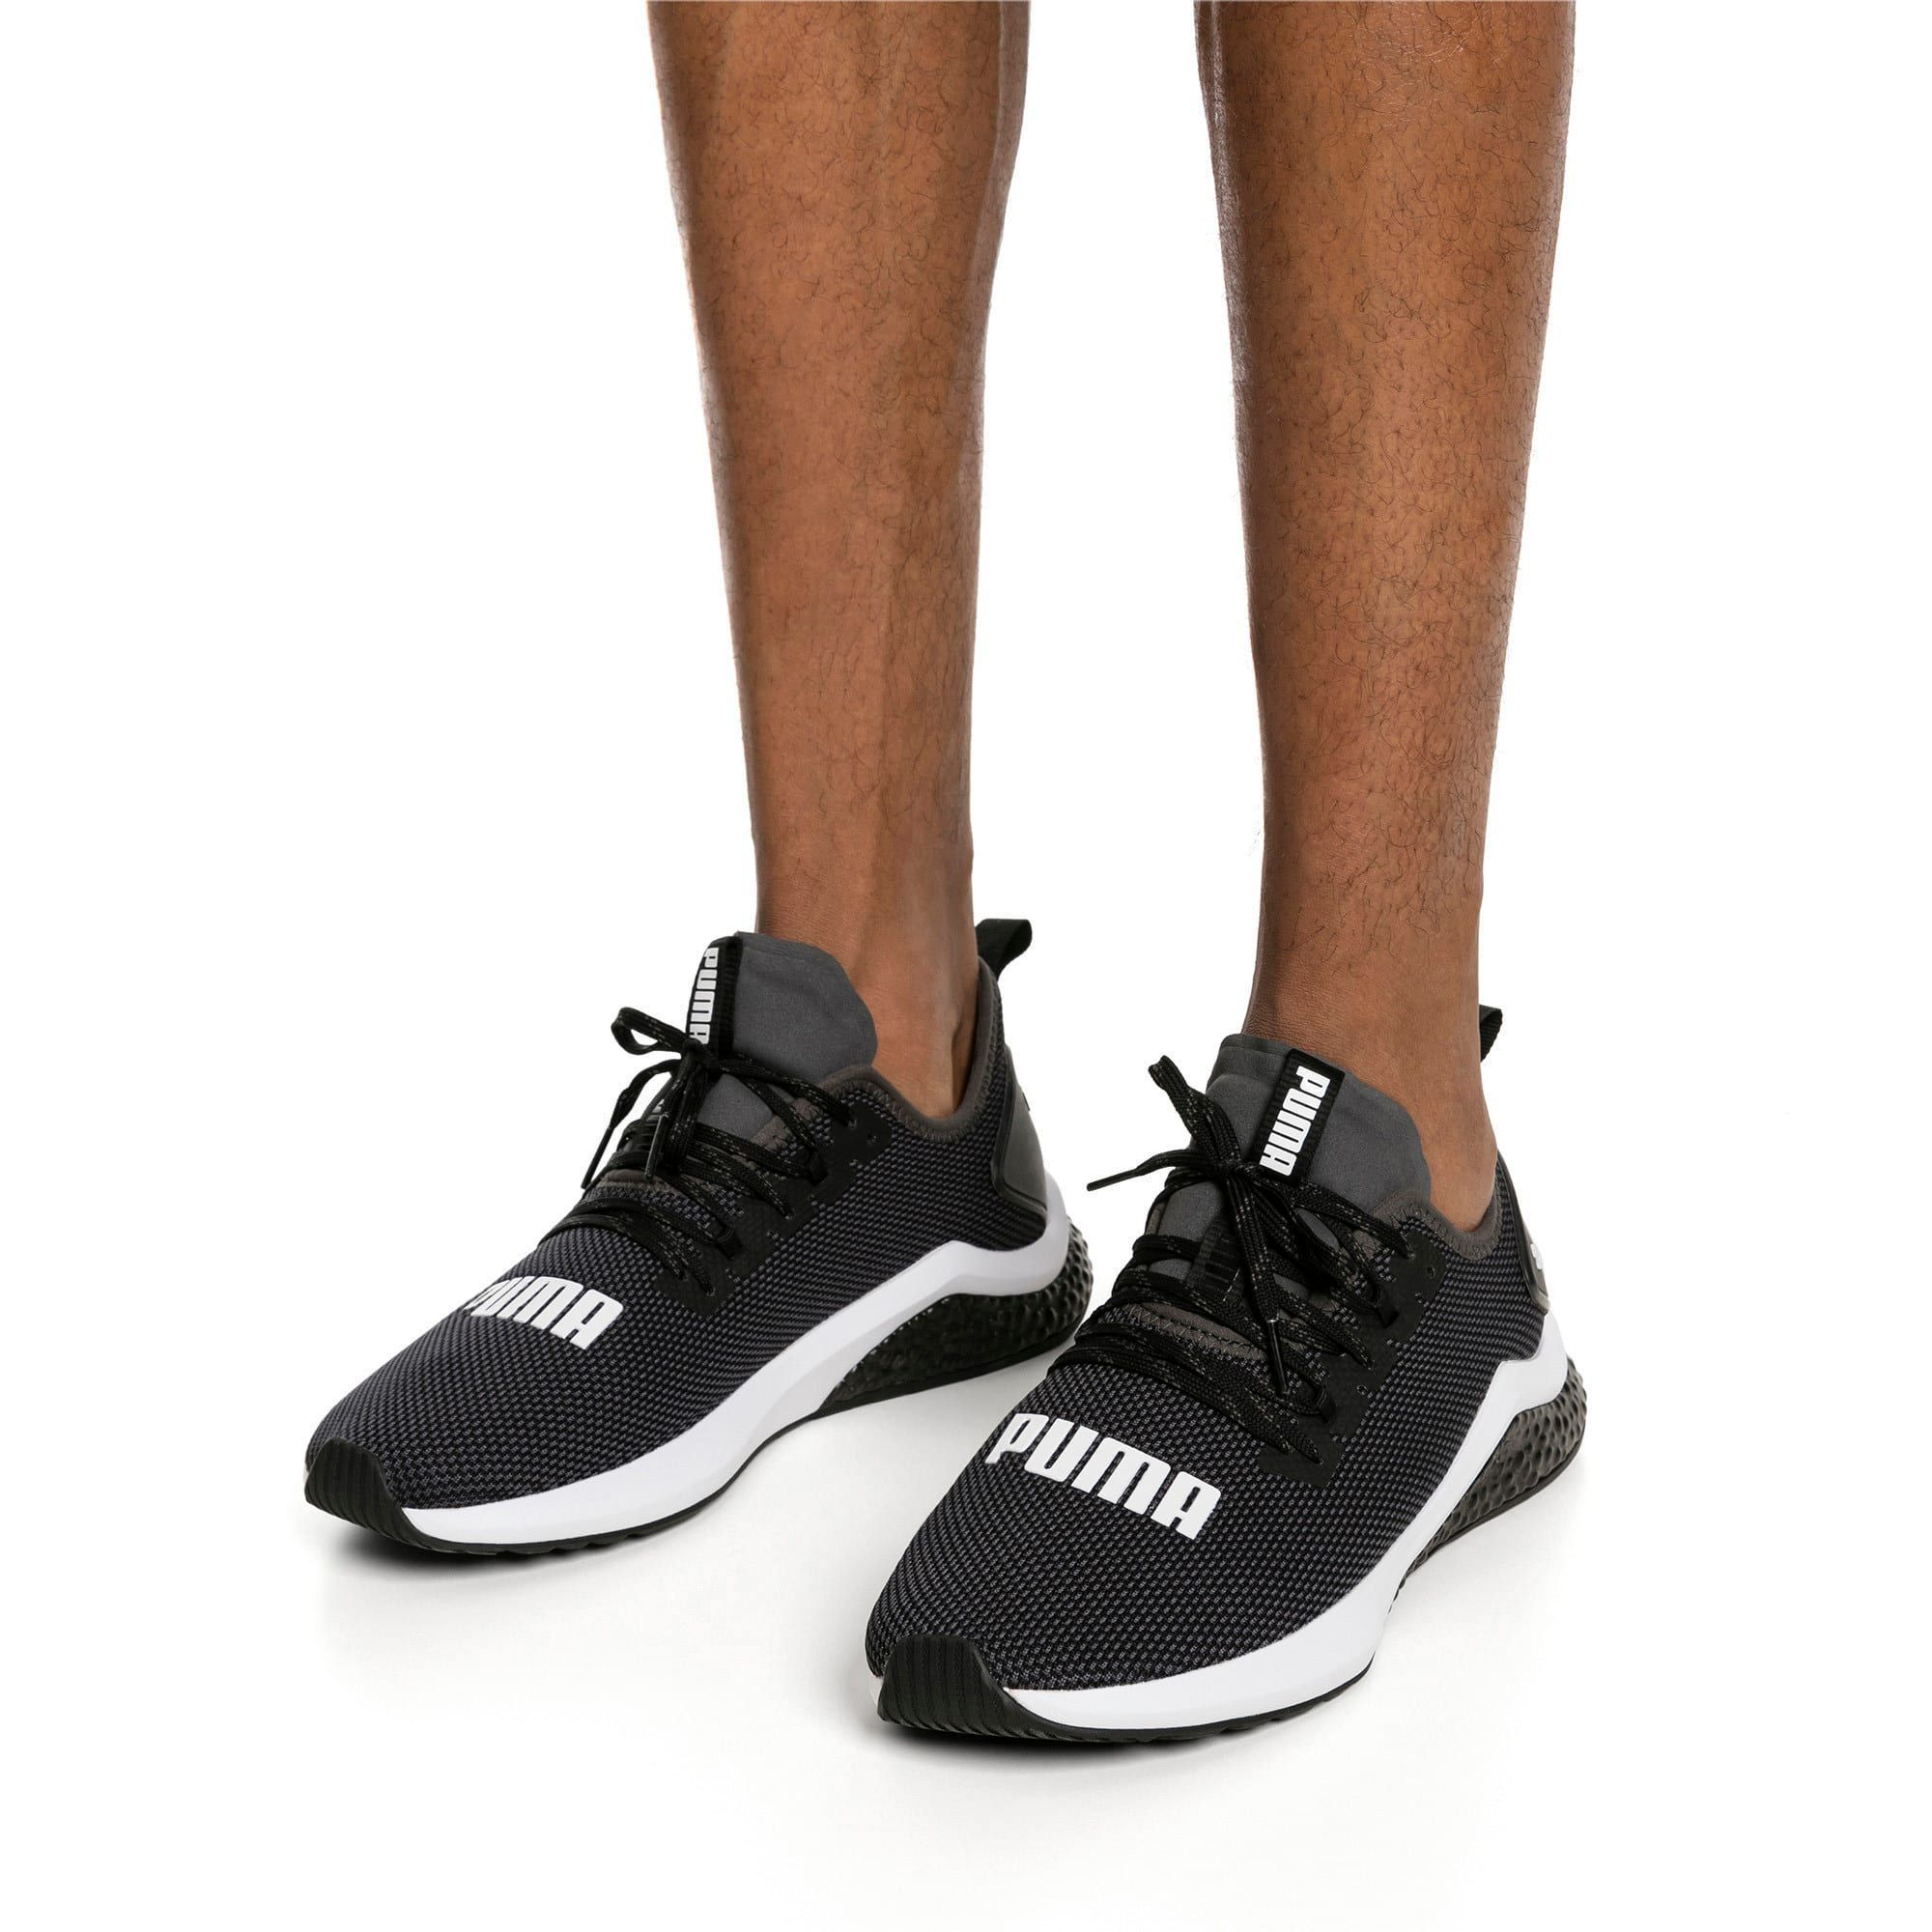 HYBRID NX Youth Sneaker